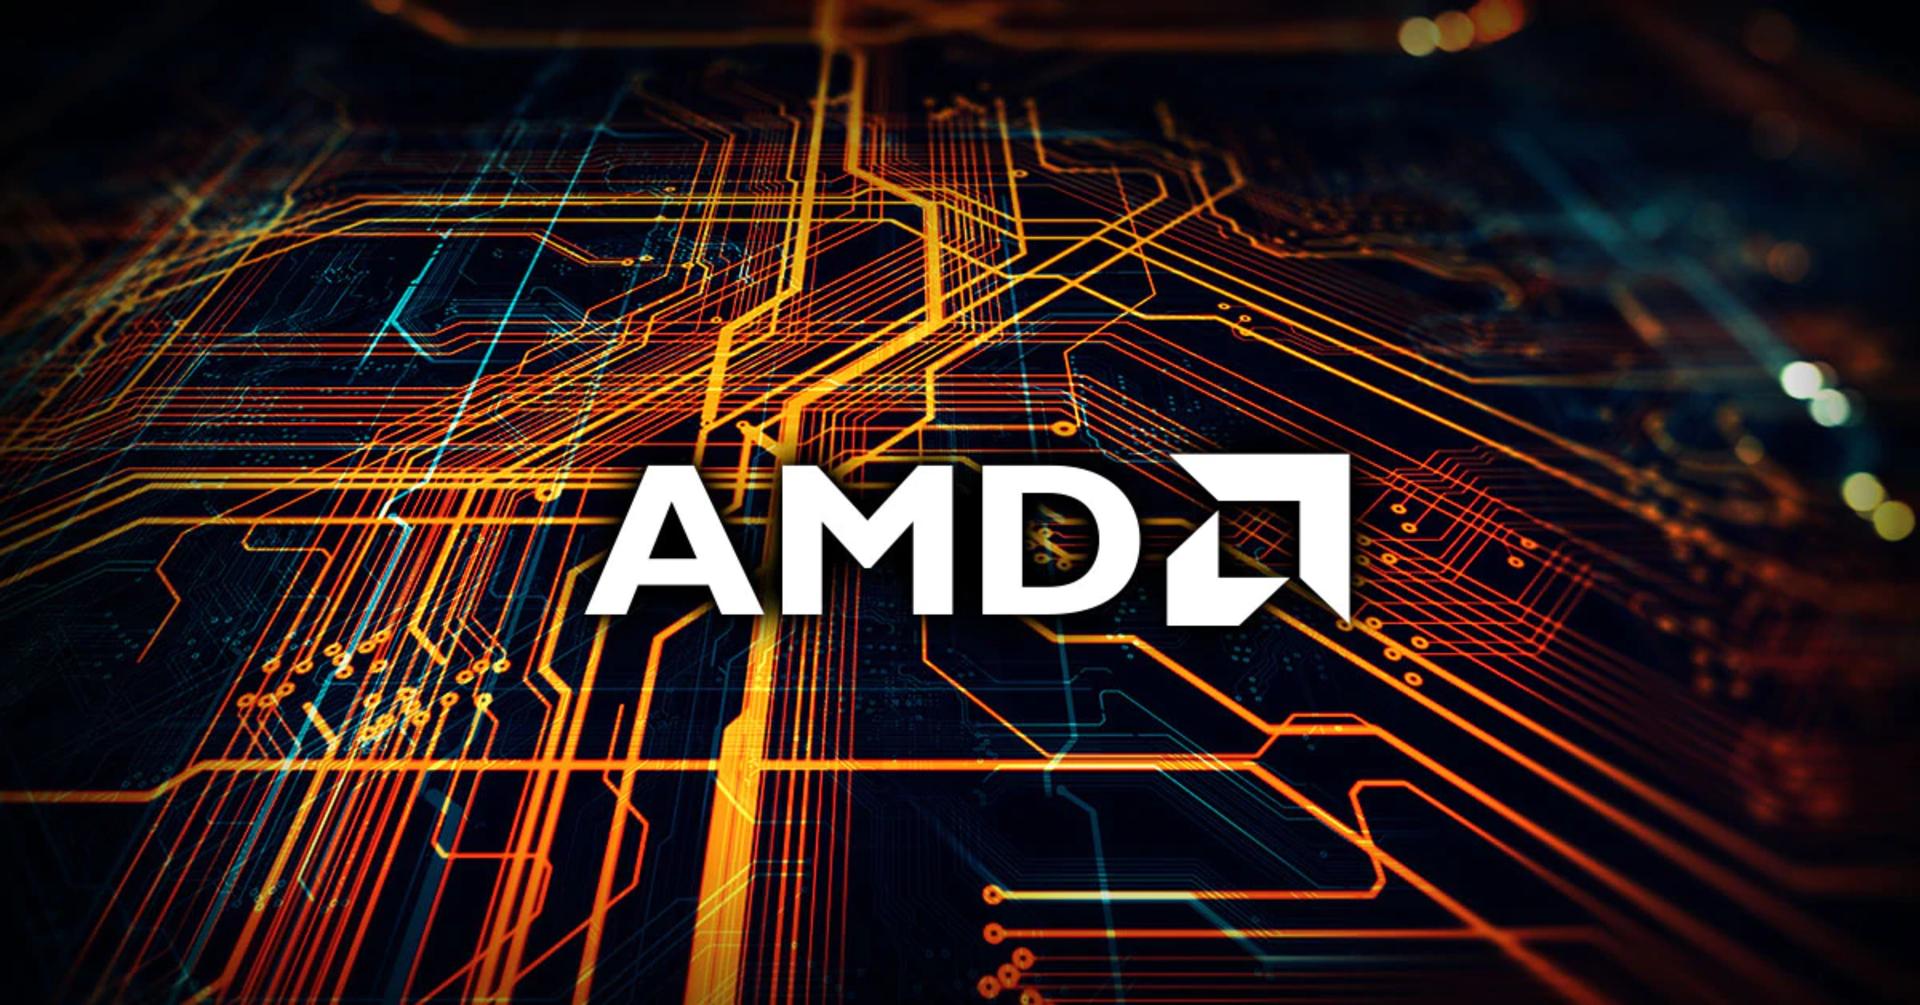 AMD processor logo on circuit background